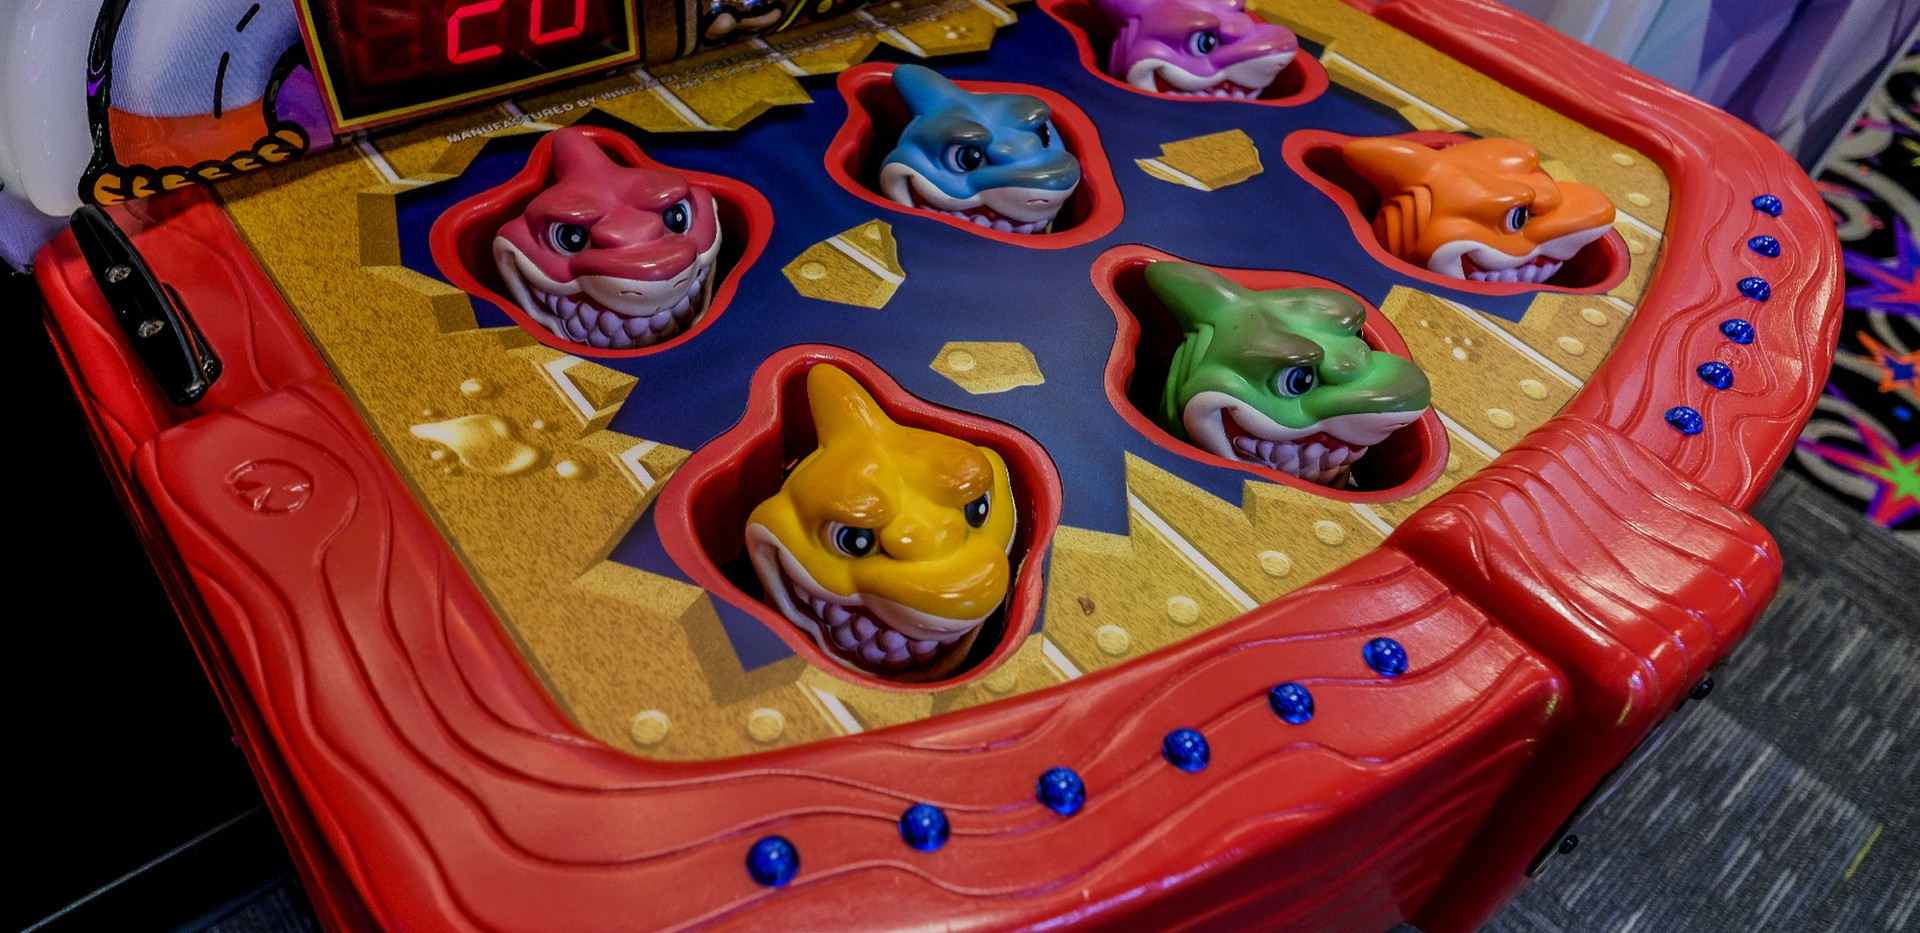 Roanoke Rapids Arcade & Gaming Center